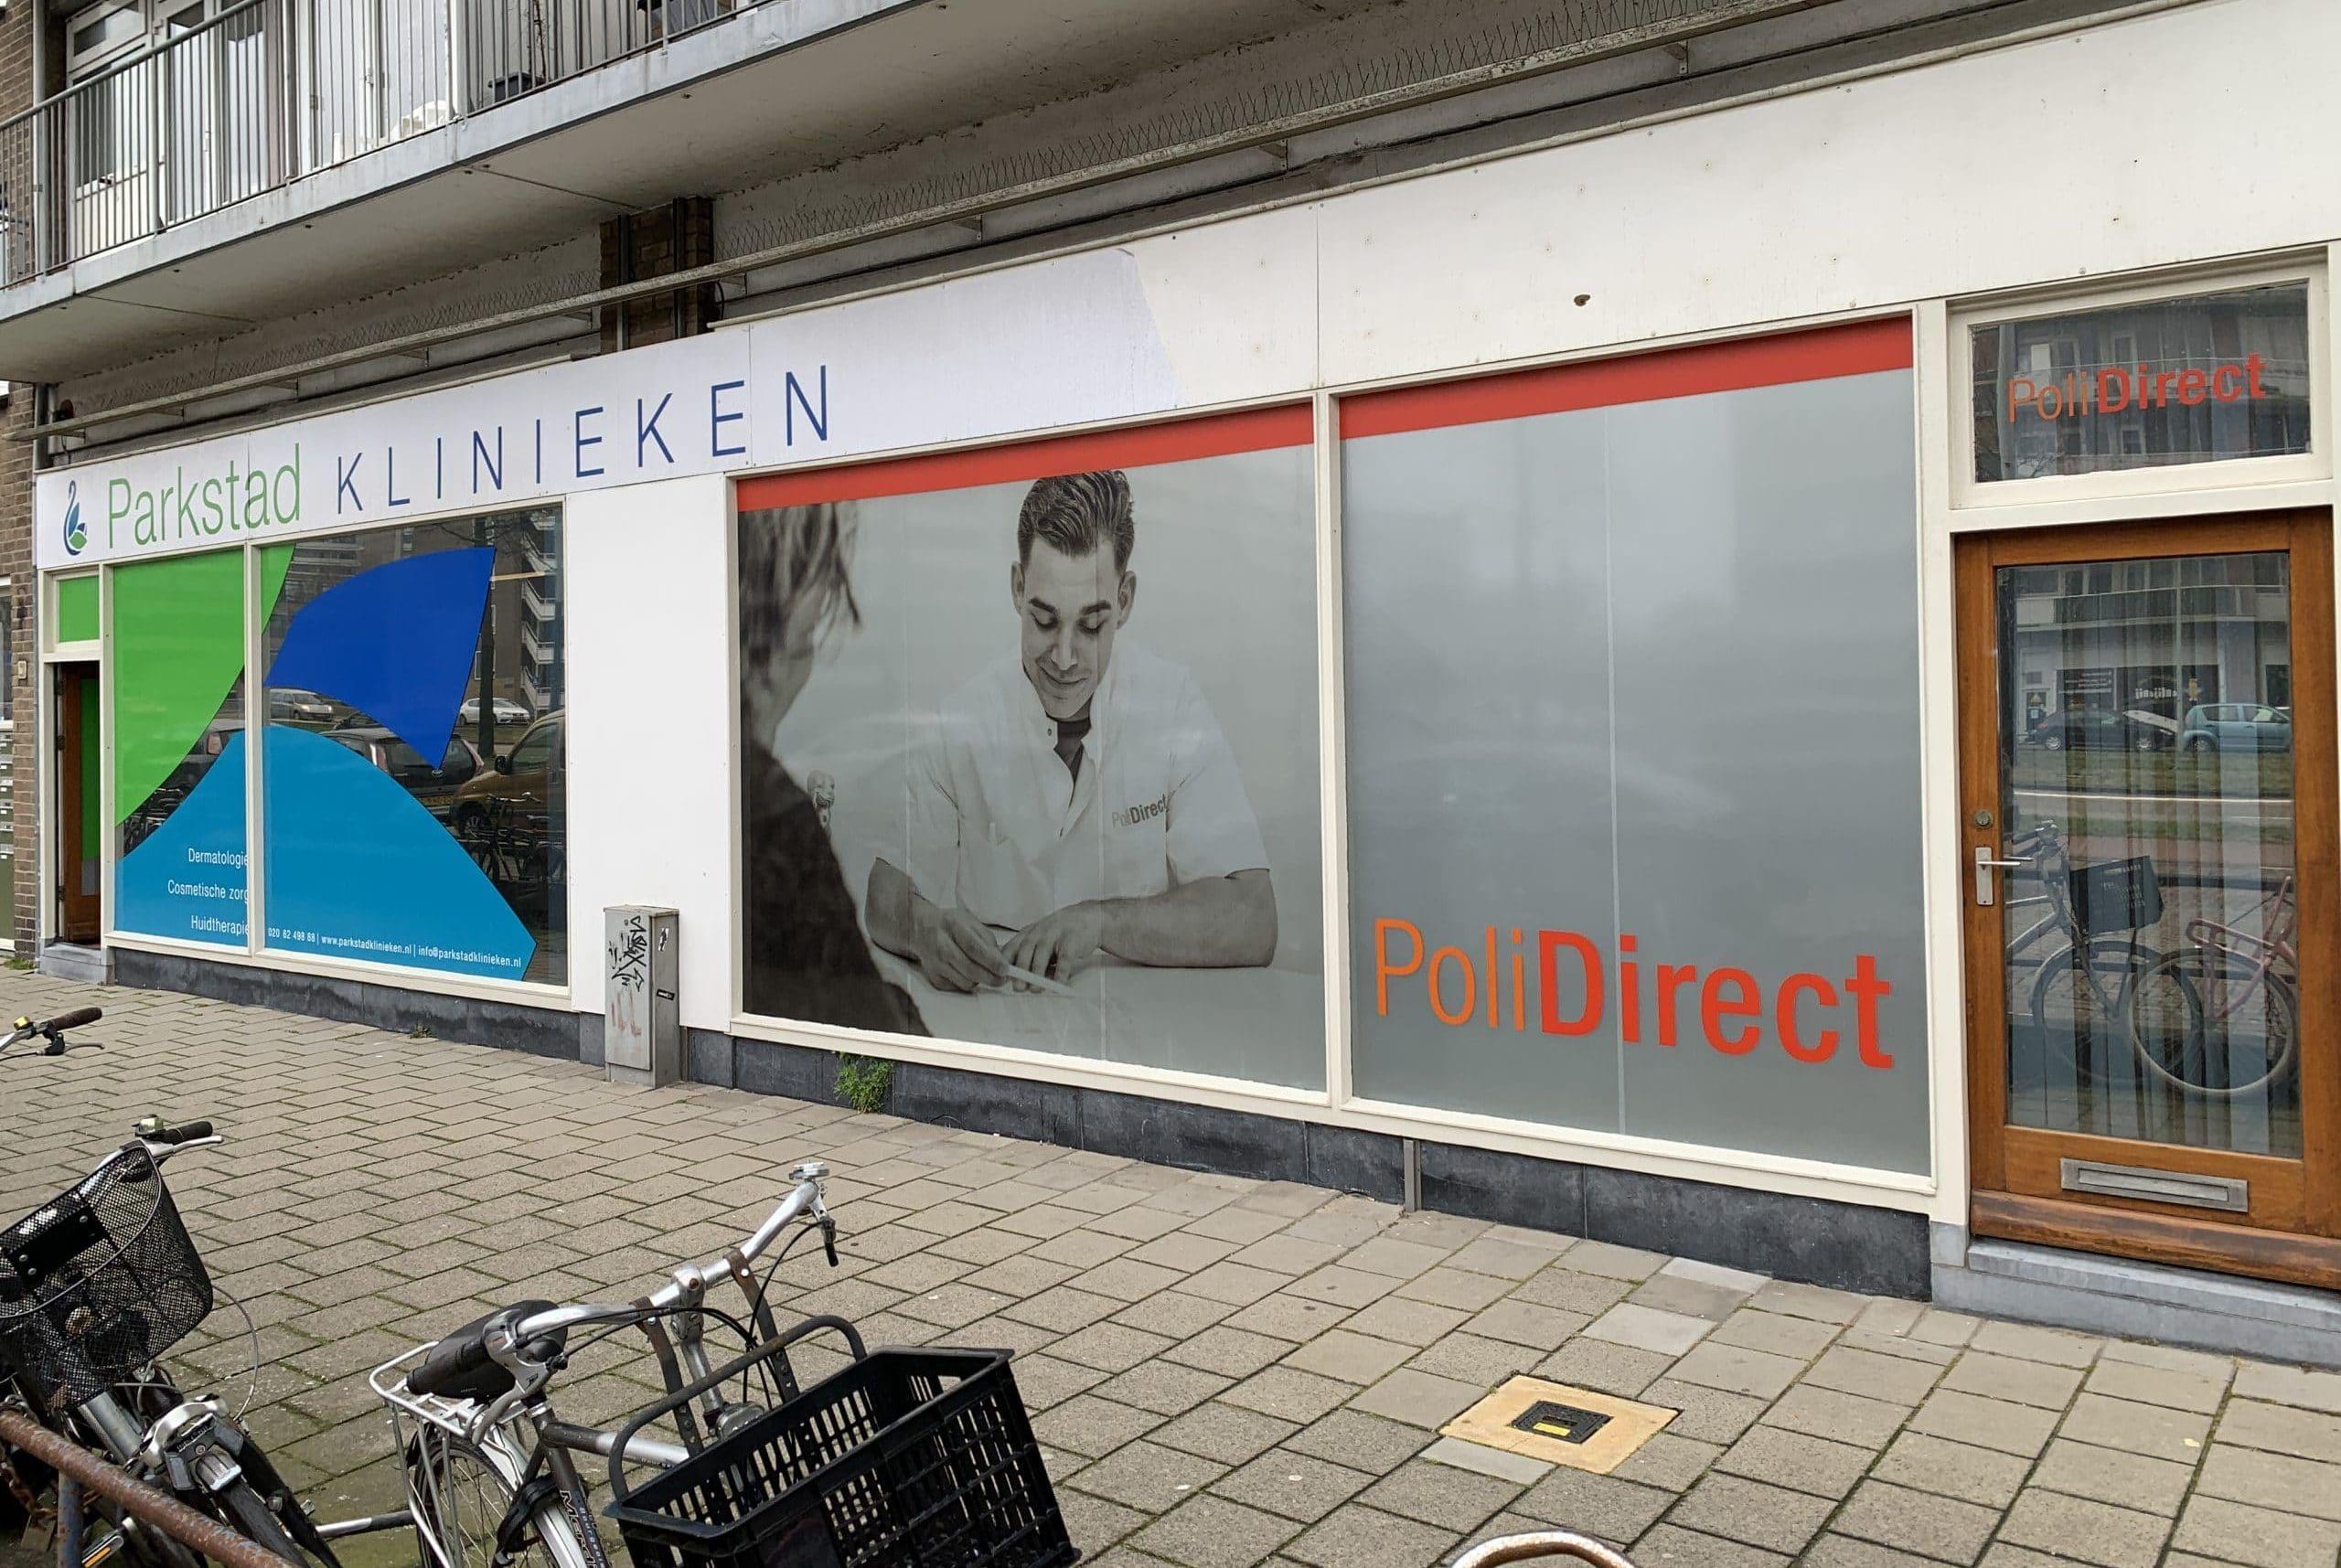 PoliDirect Amsterdam West